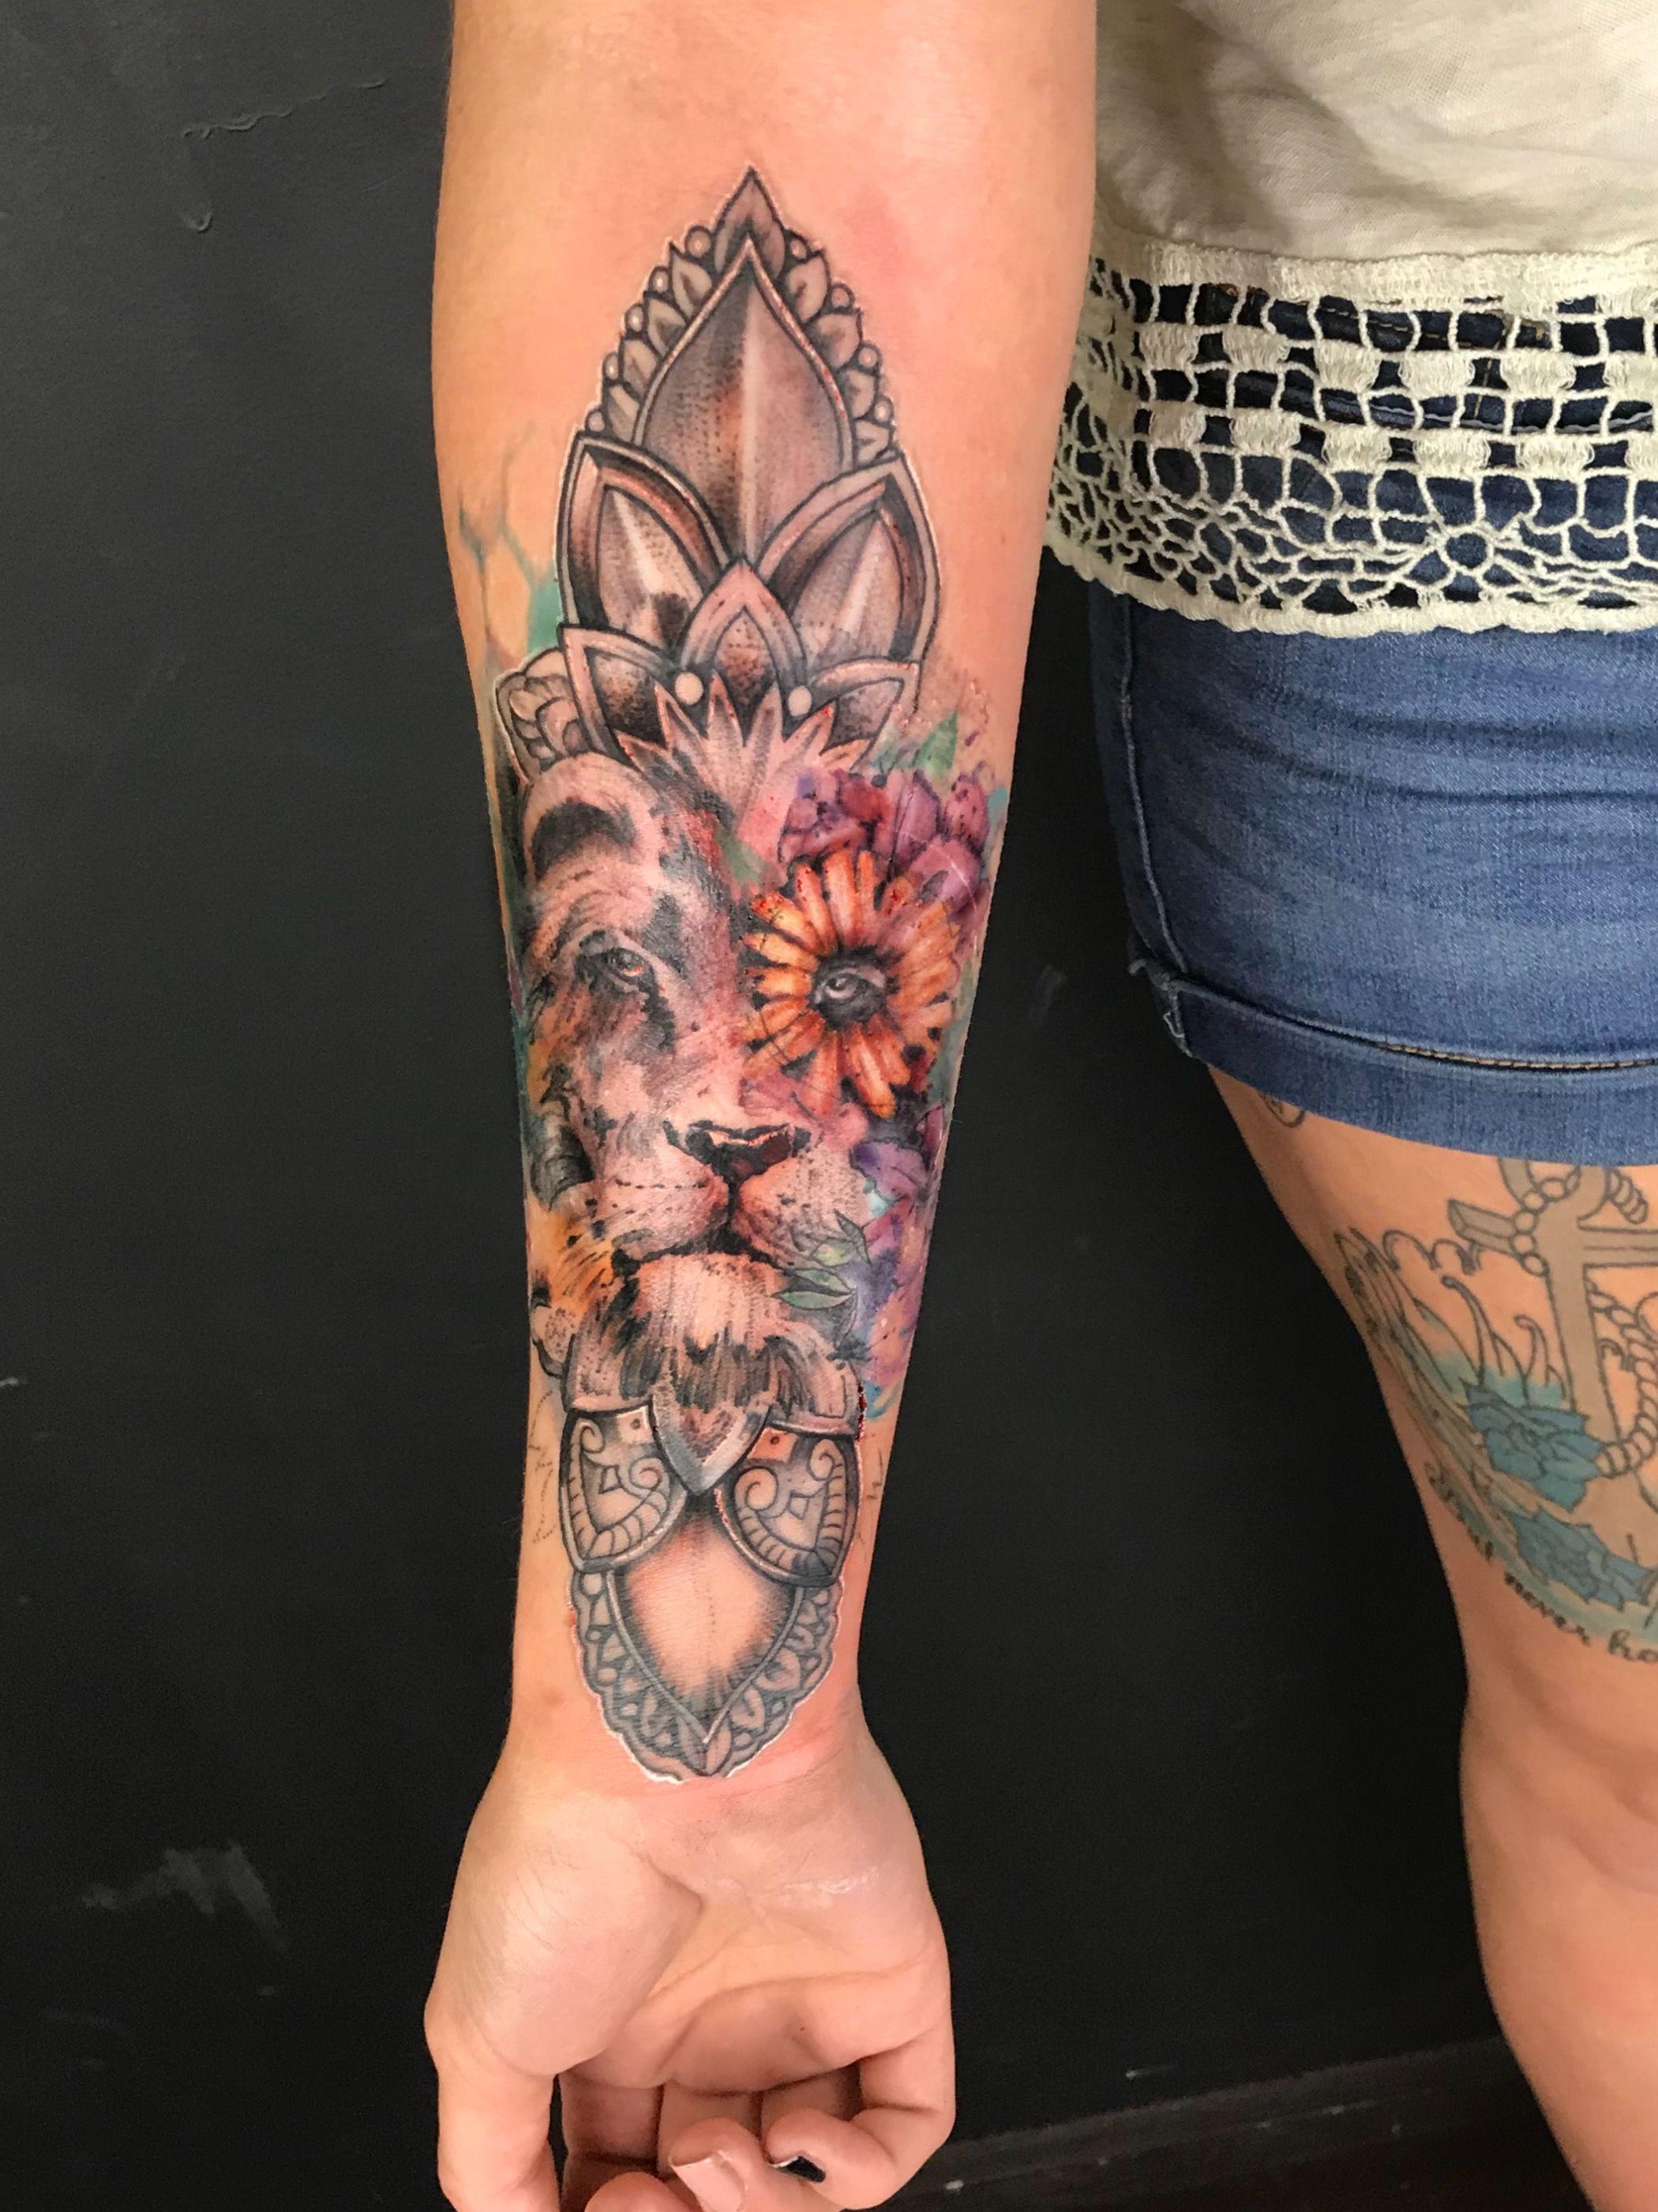 Beautiful tattoo by jordyn grine tattoo done at evolved